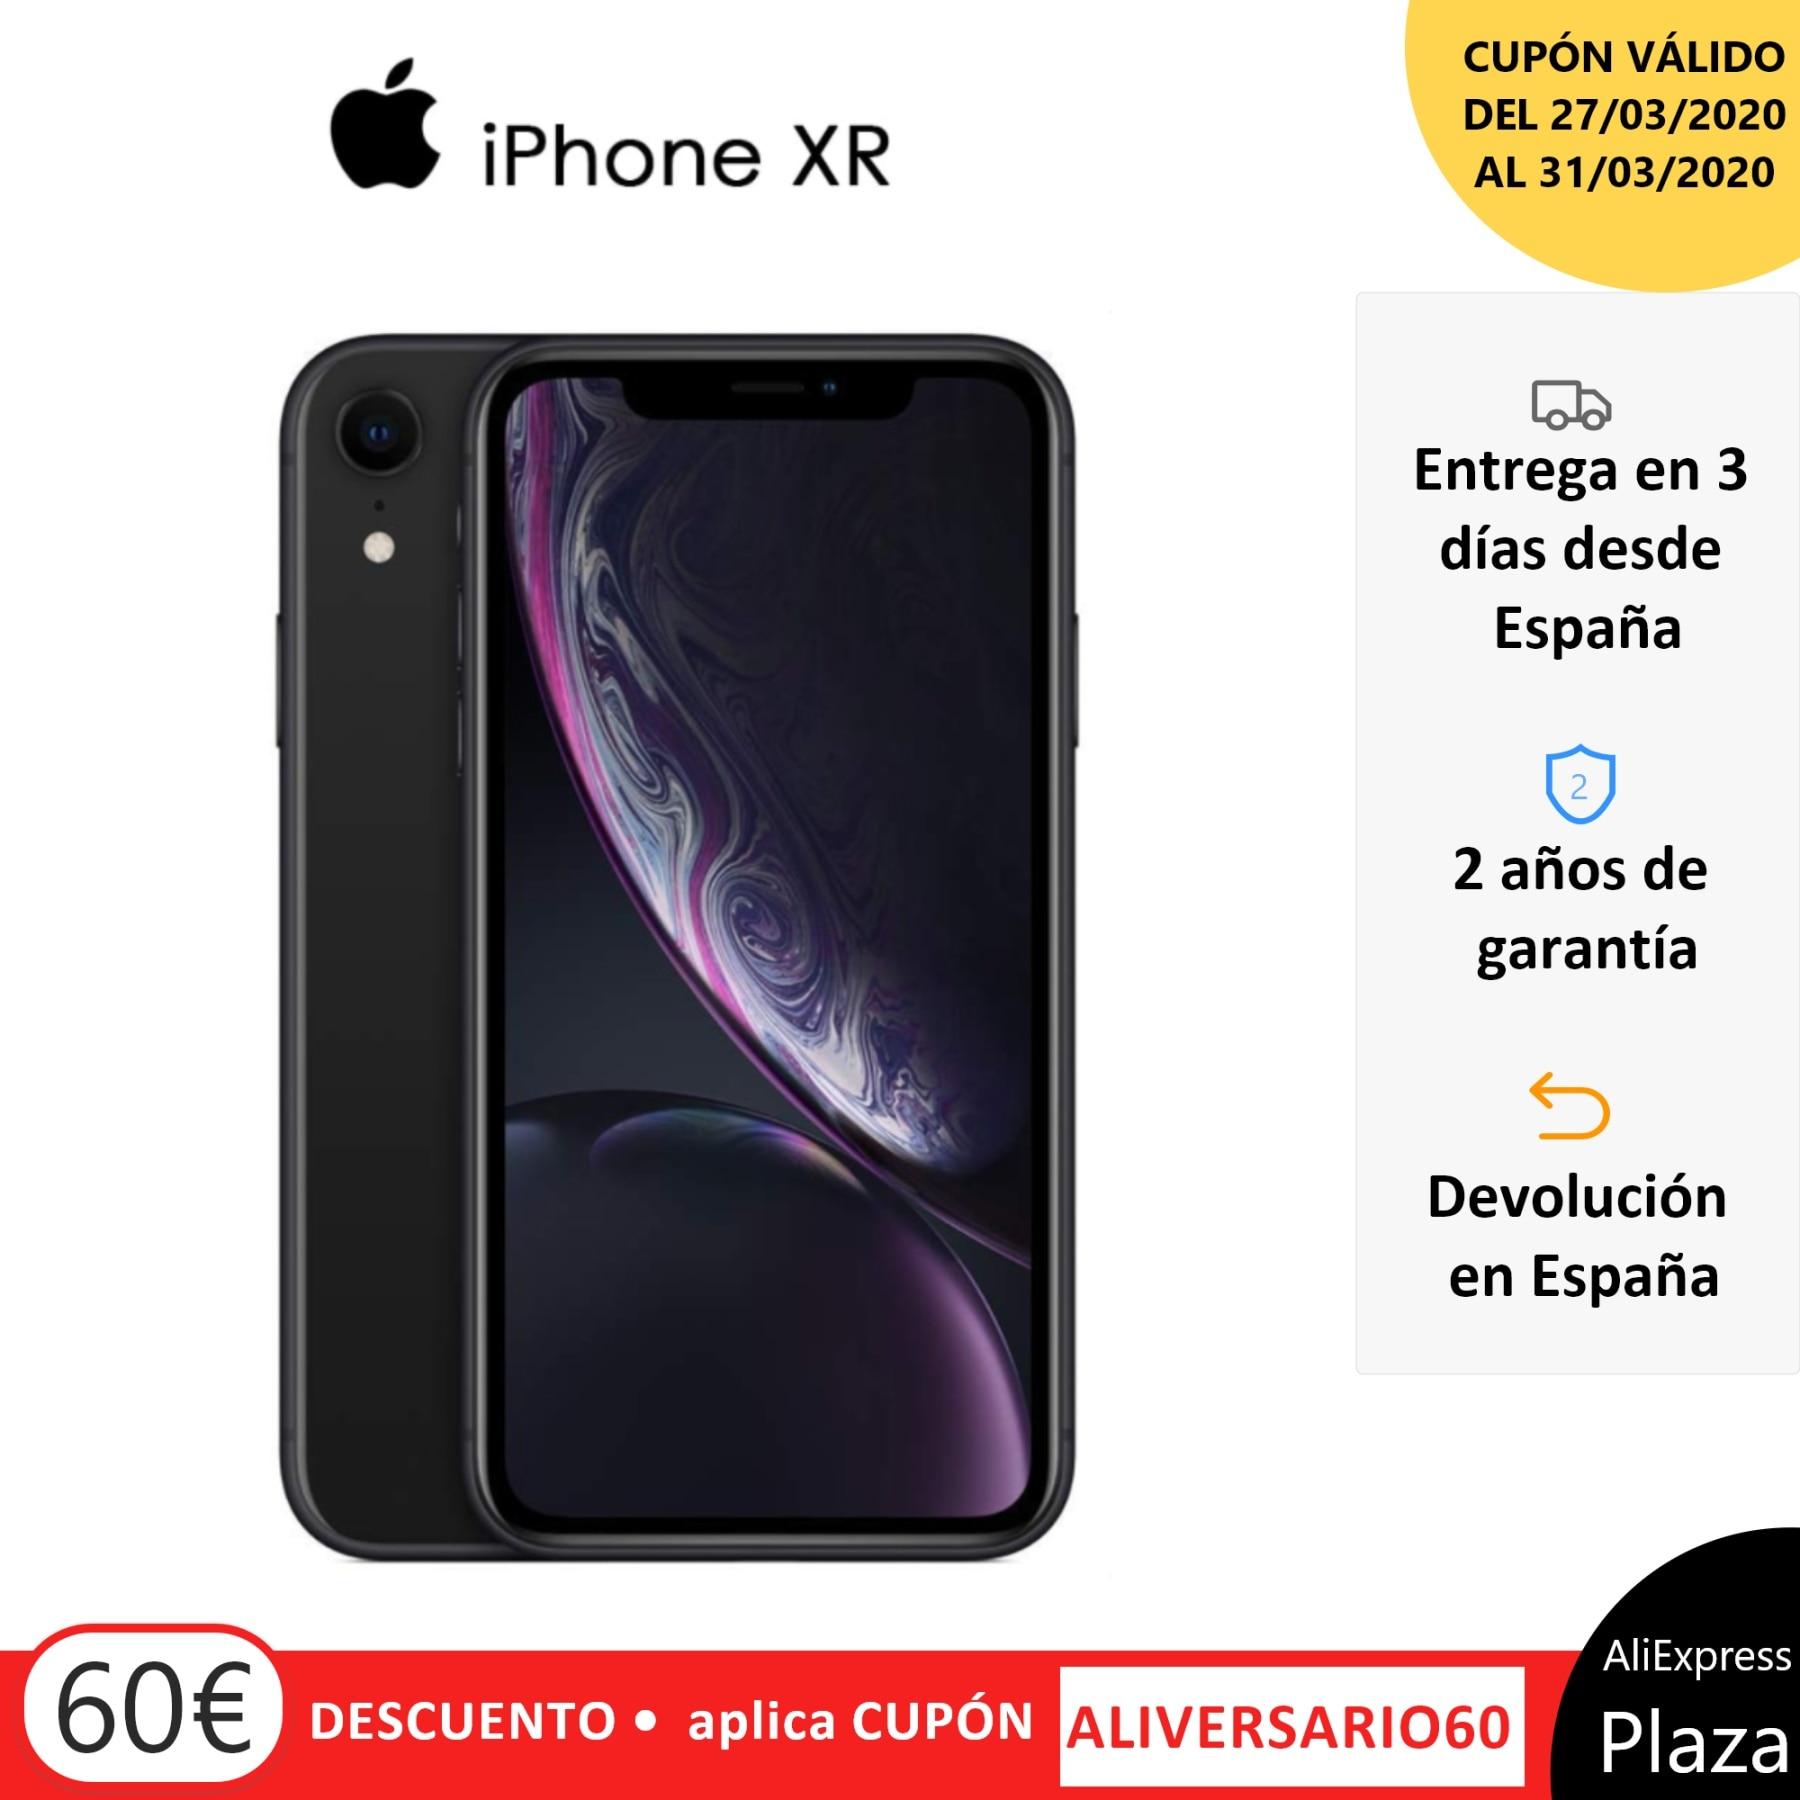 Smartphone apple iphone xr, 64 gb, 3 gb ram, banda 4g/lte/wi-fi, 15,5 cm (pantalla 6.1